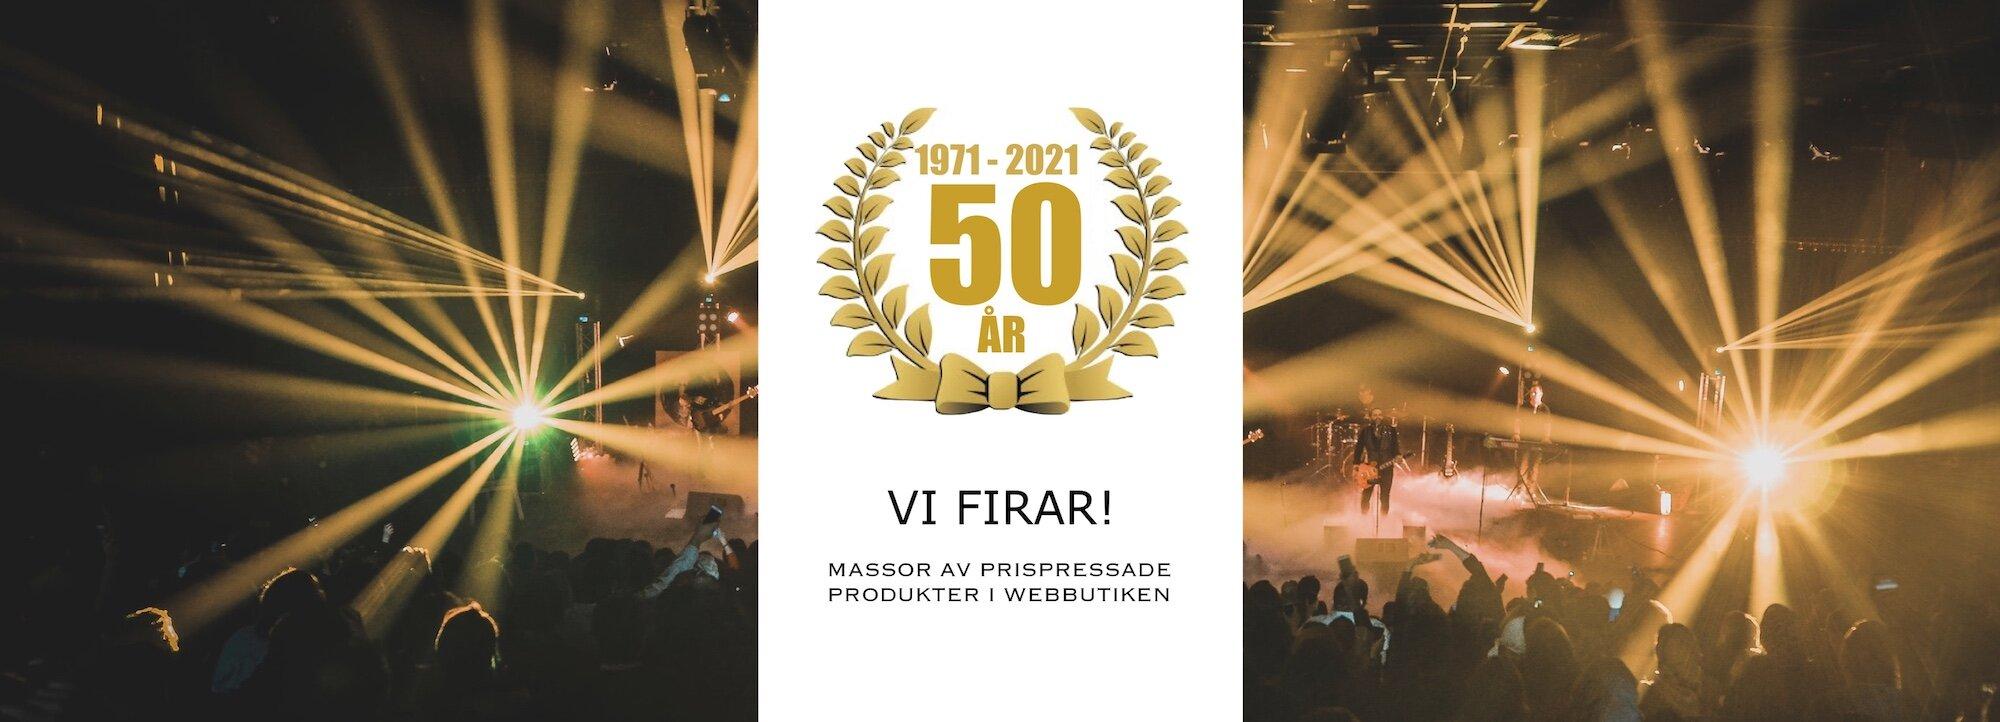 https://www.promixsweden.se/pub_docs/files/StartsidaFlight/50ar-nya2.jpg